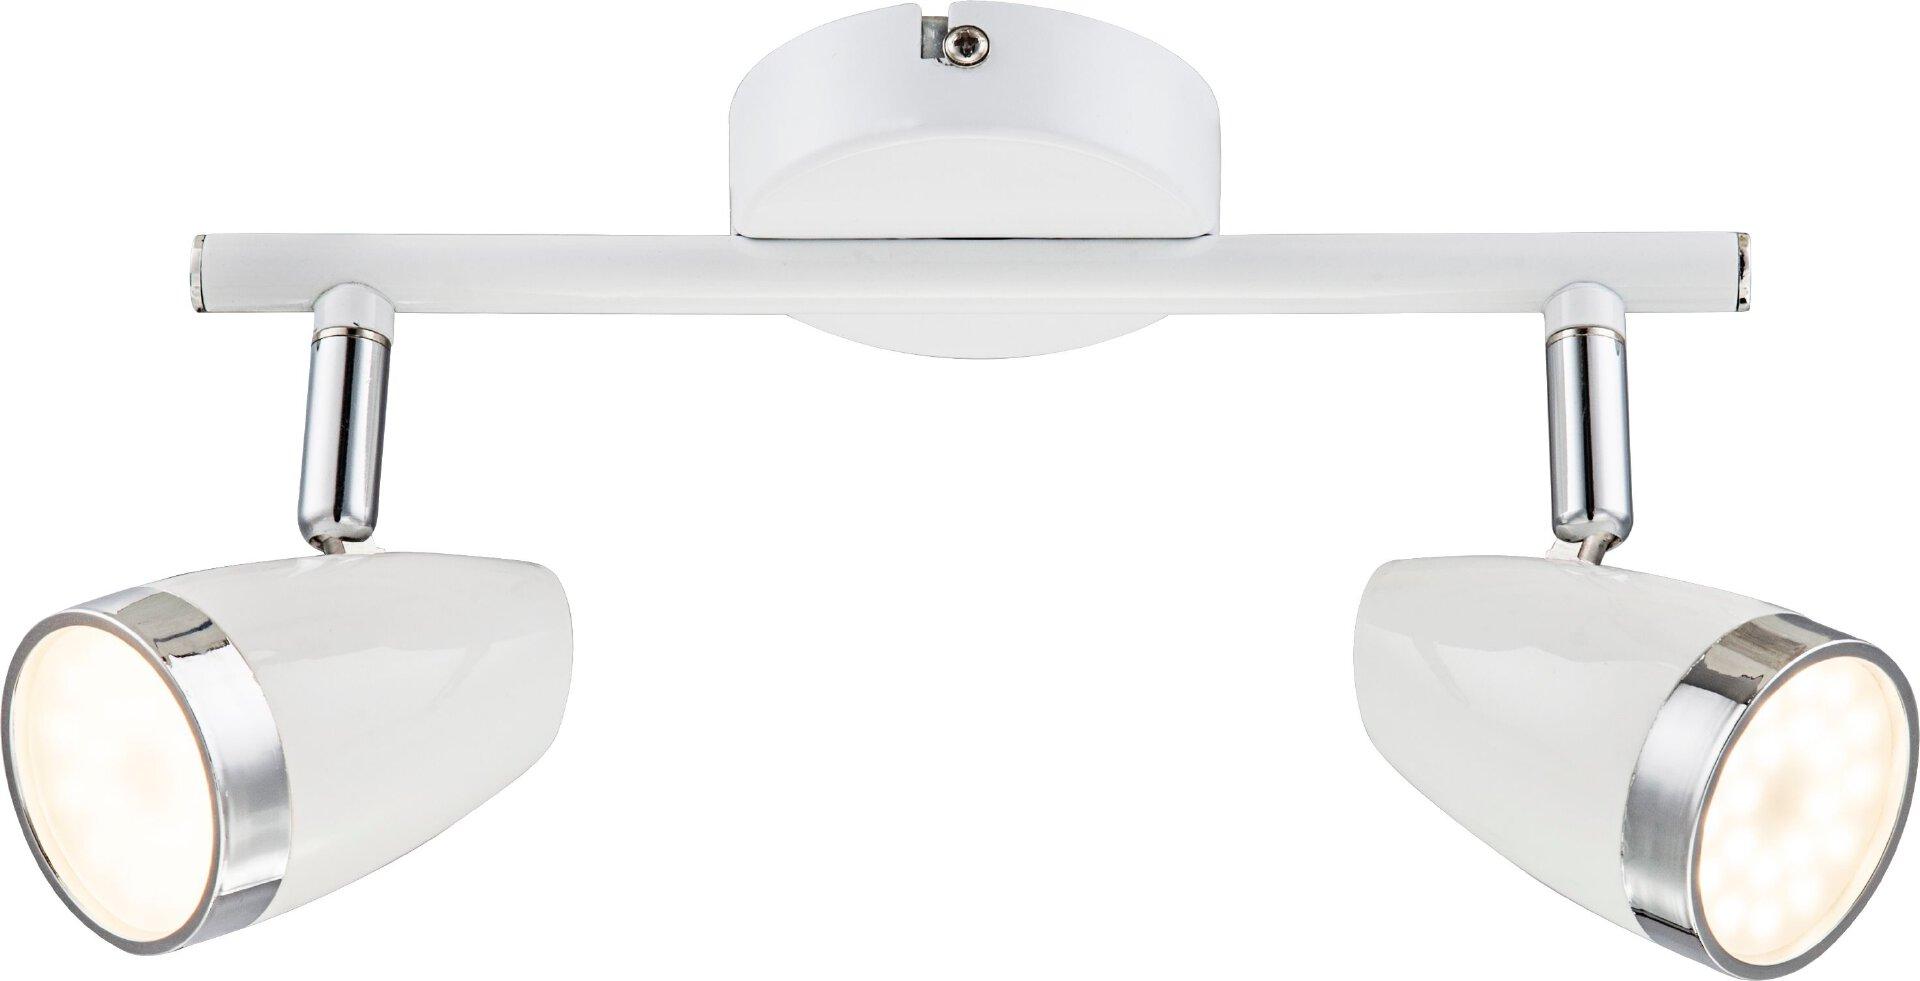 LED Strahler im Retro Look